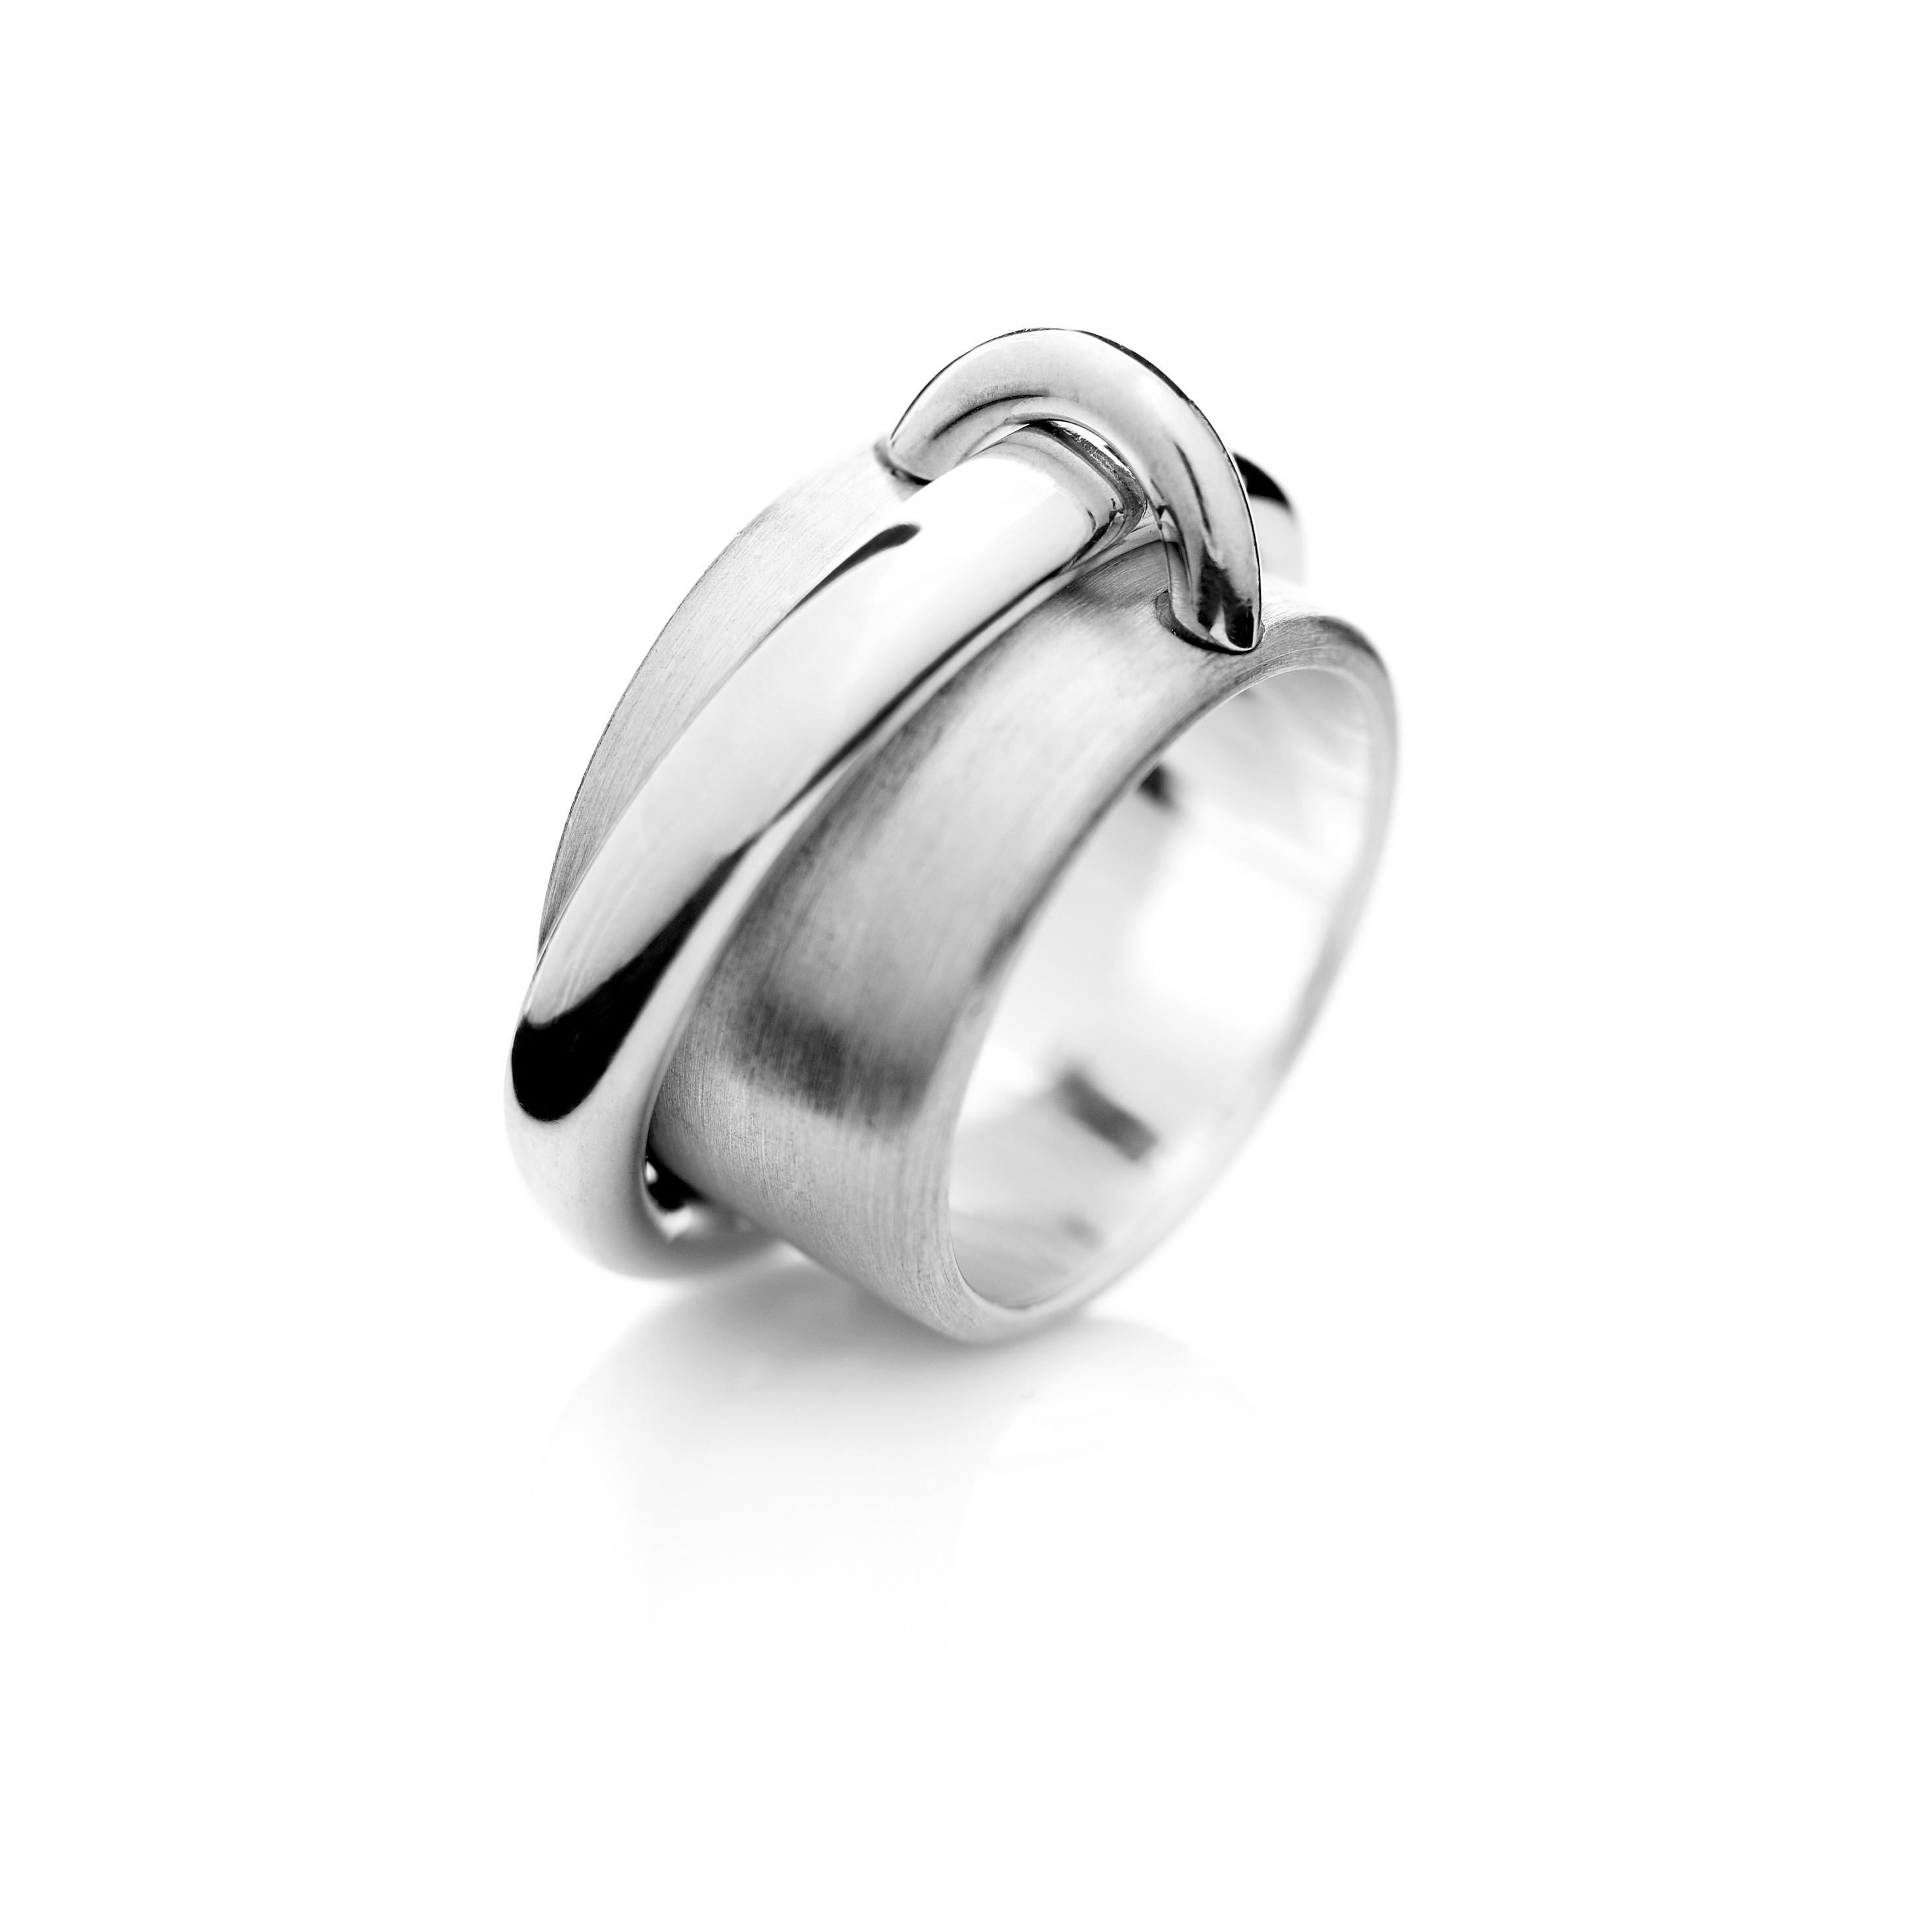 Saturn ring sterlingsilver